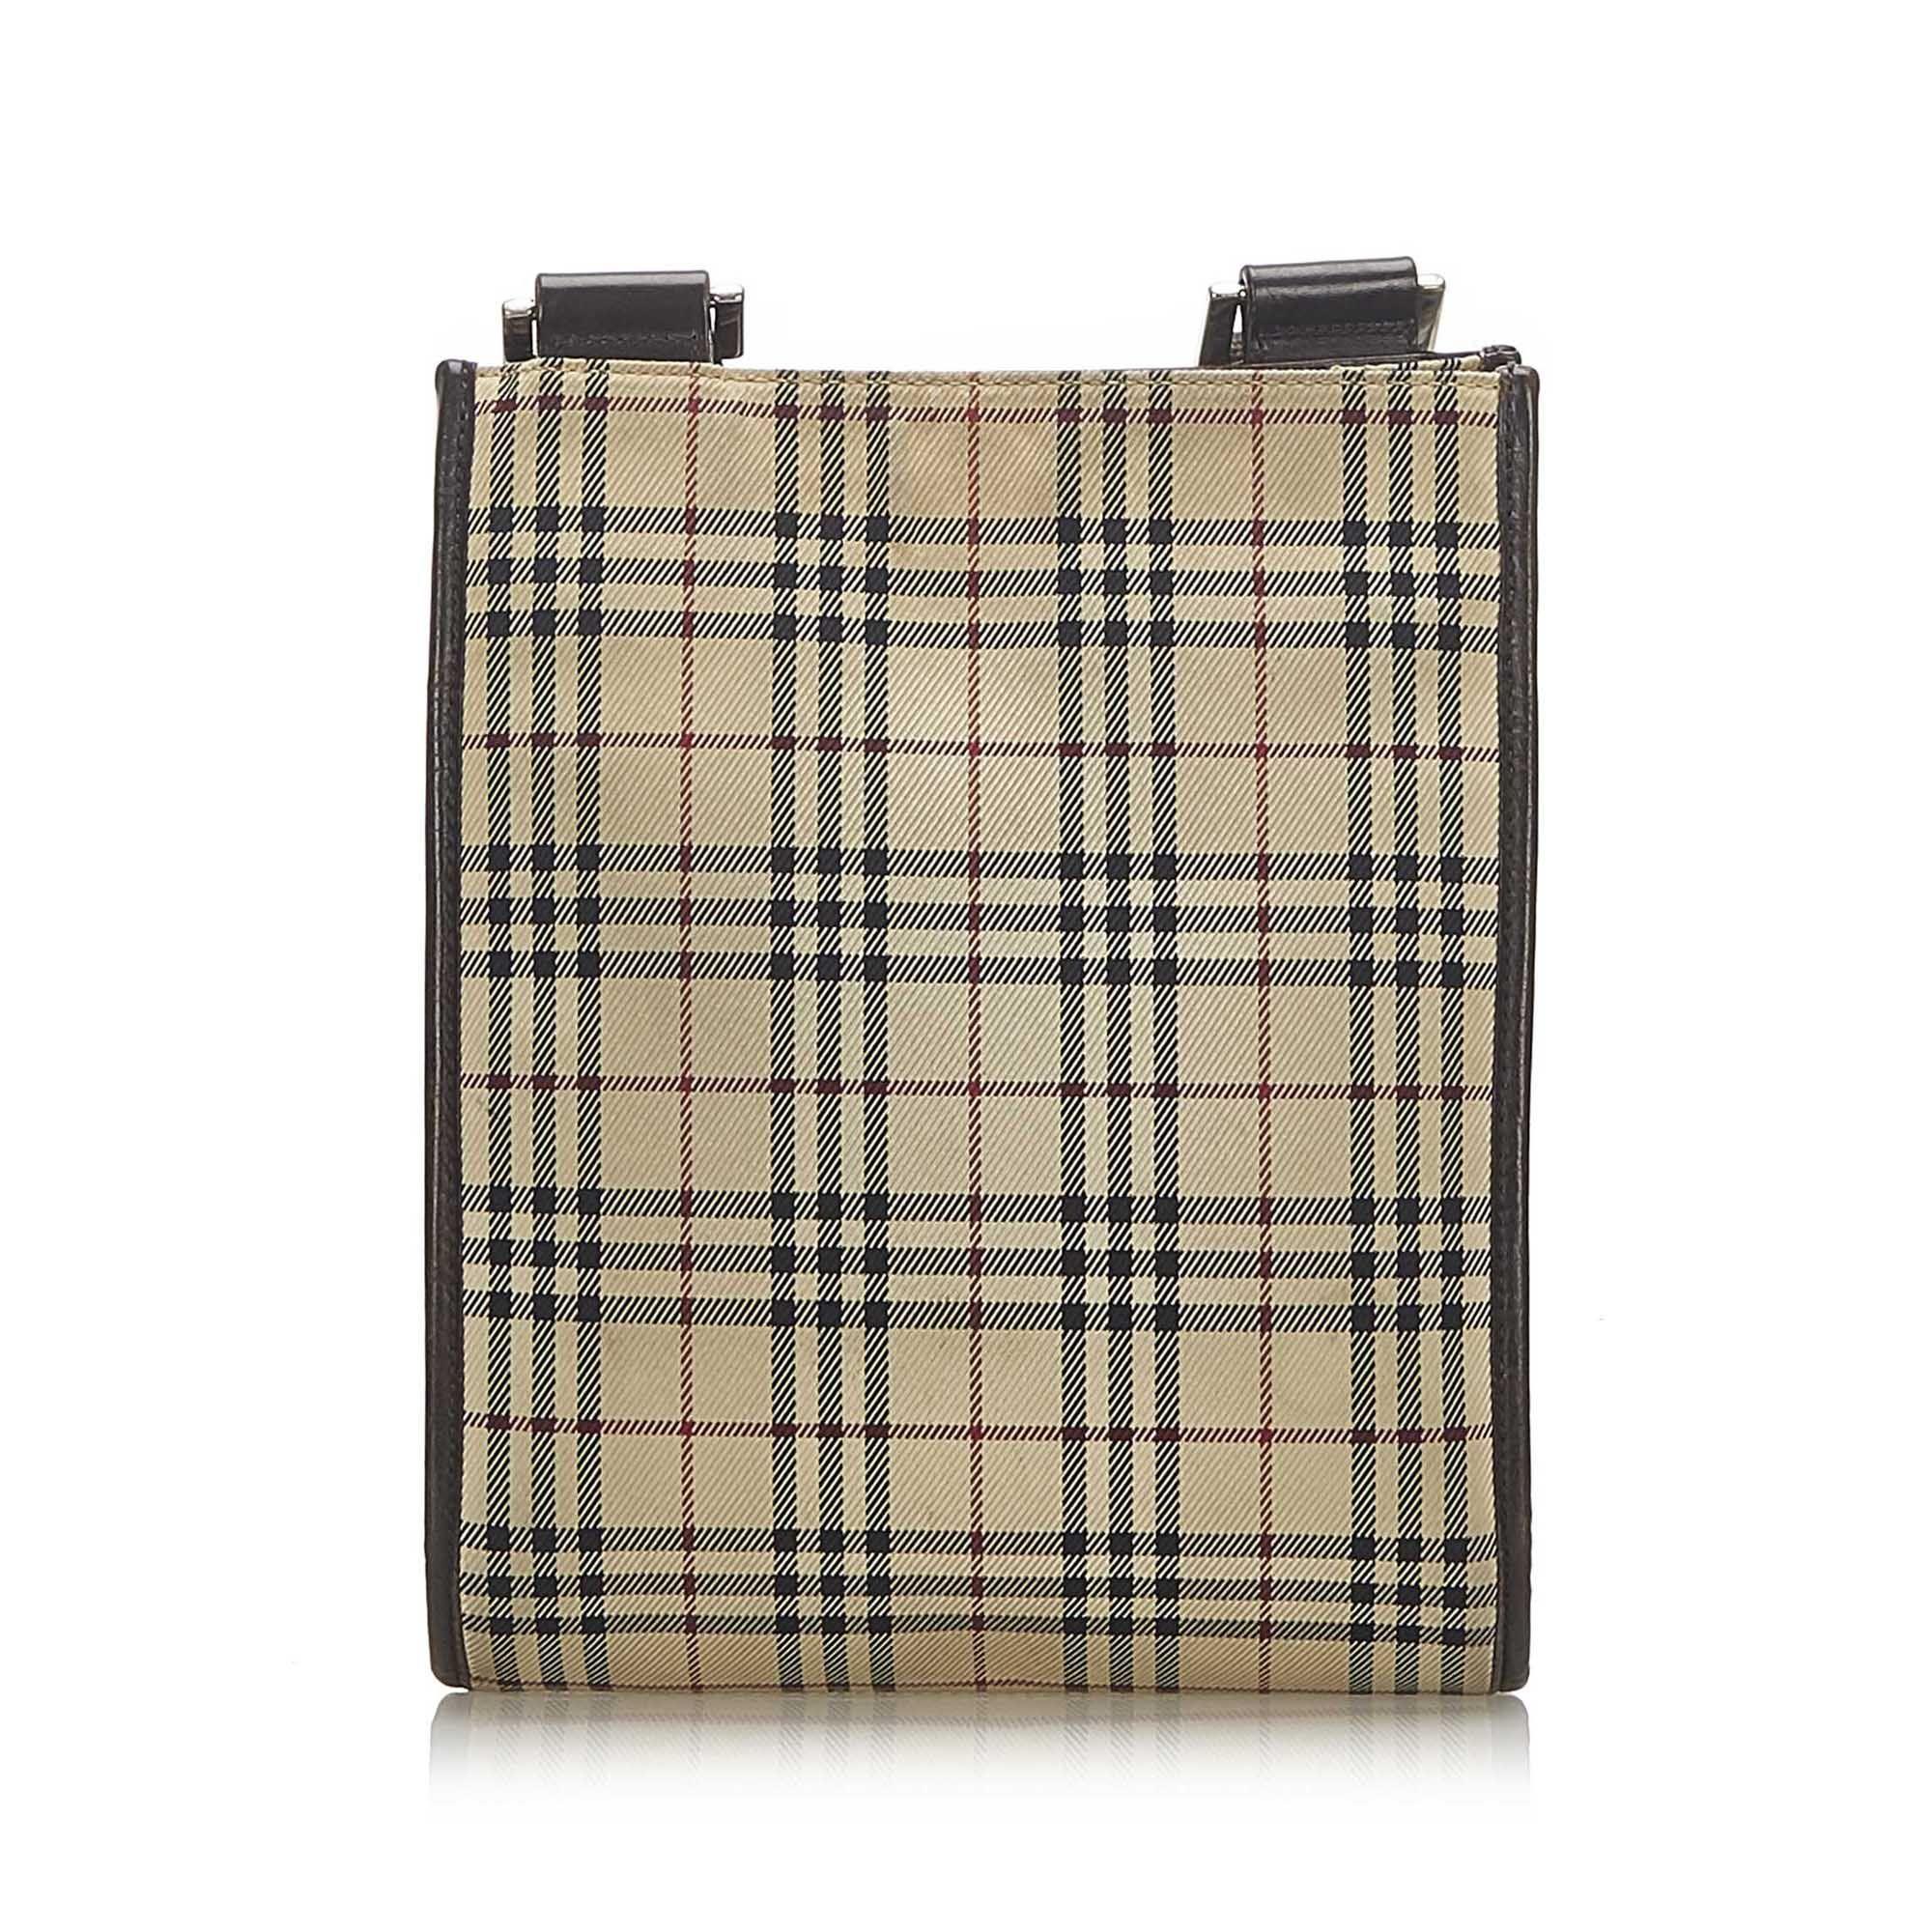 Vintage Burberry House Check Canvas Crossbody Bag Brown